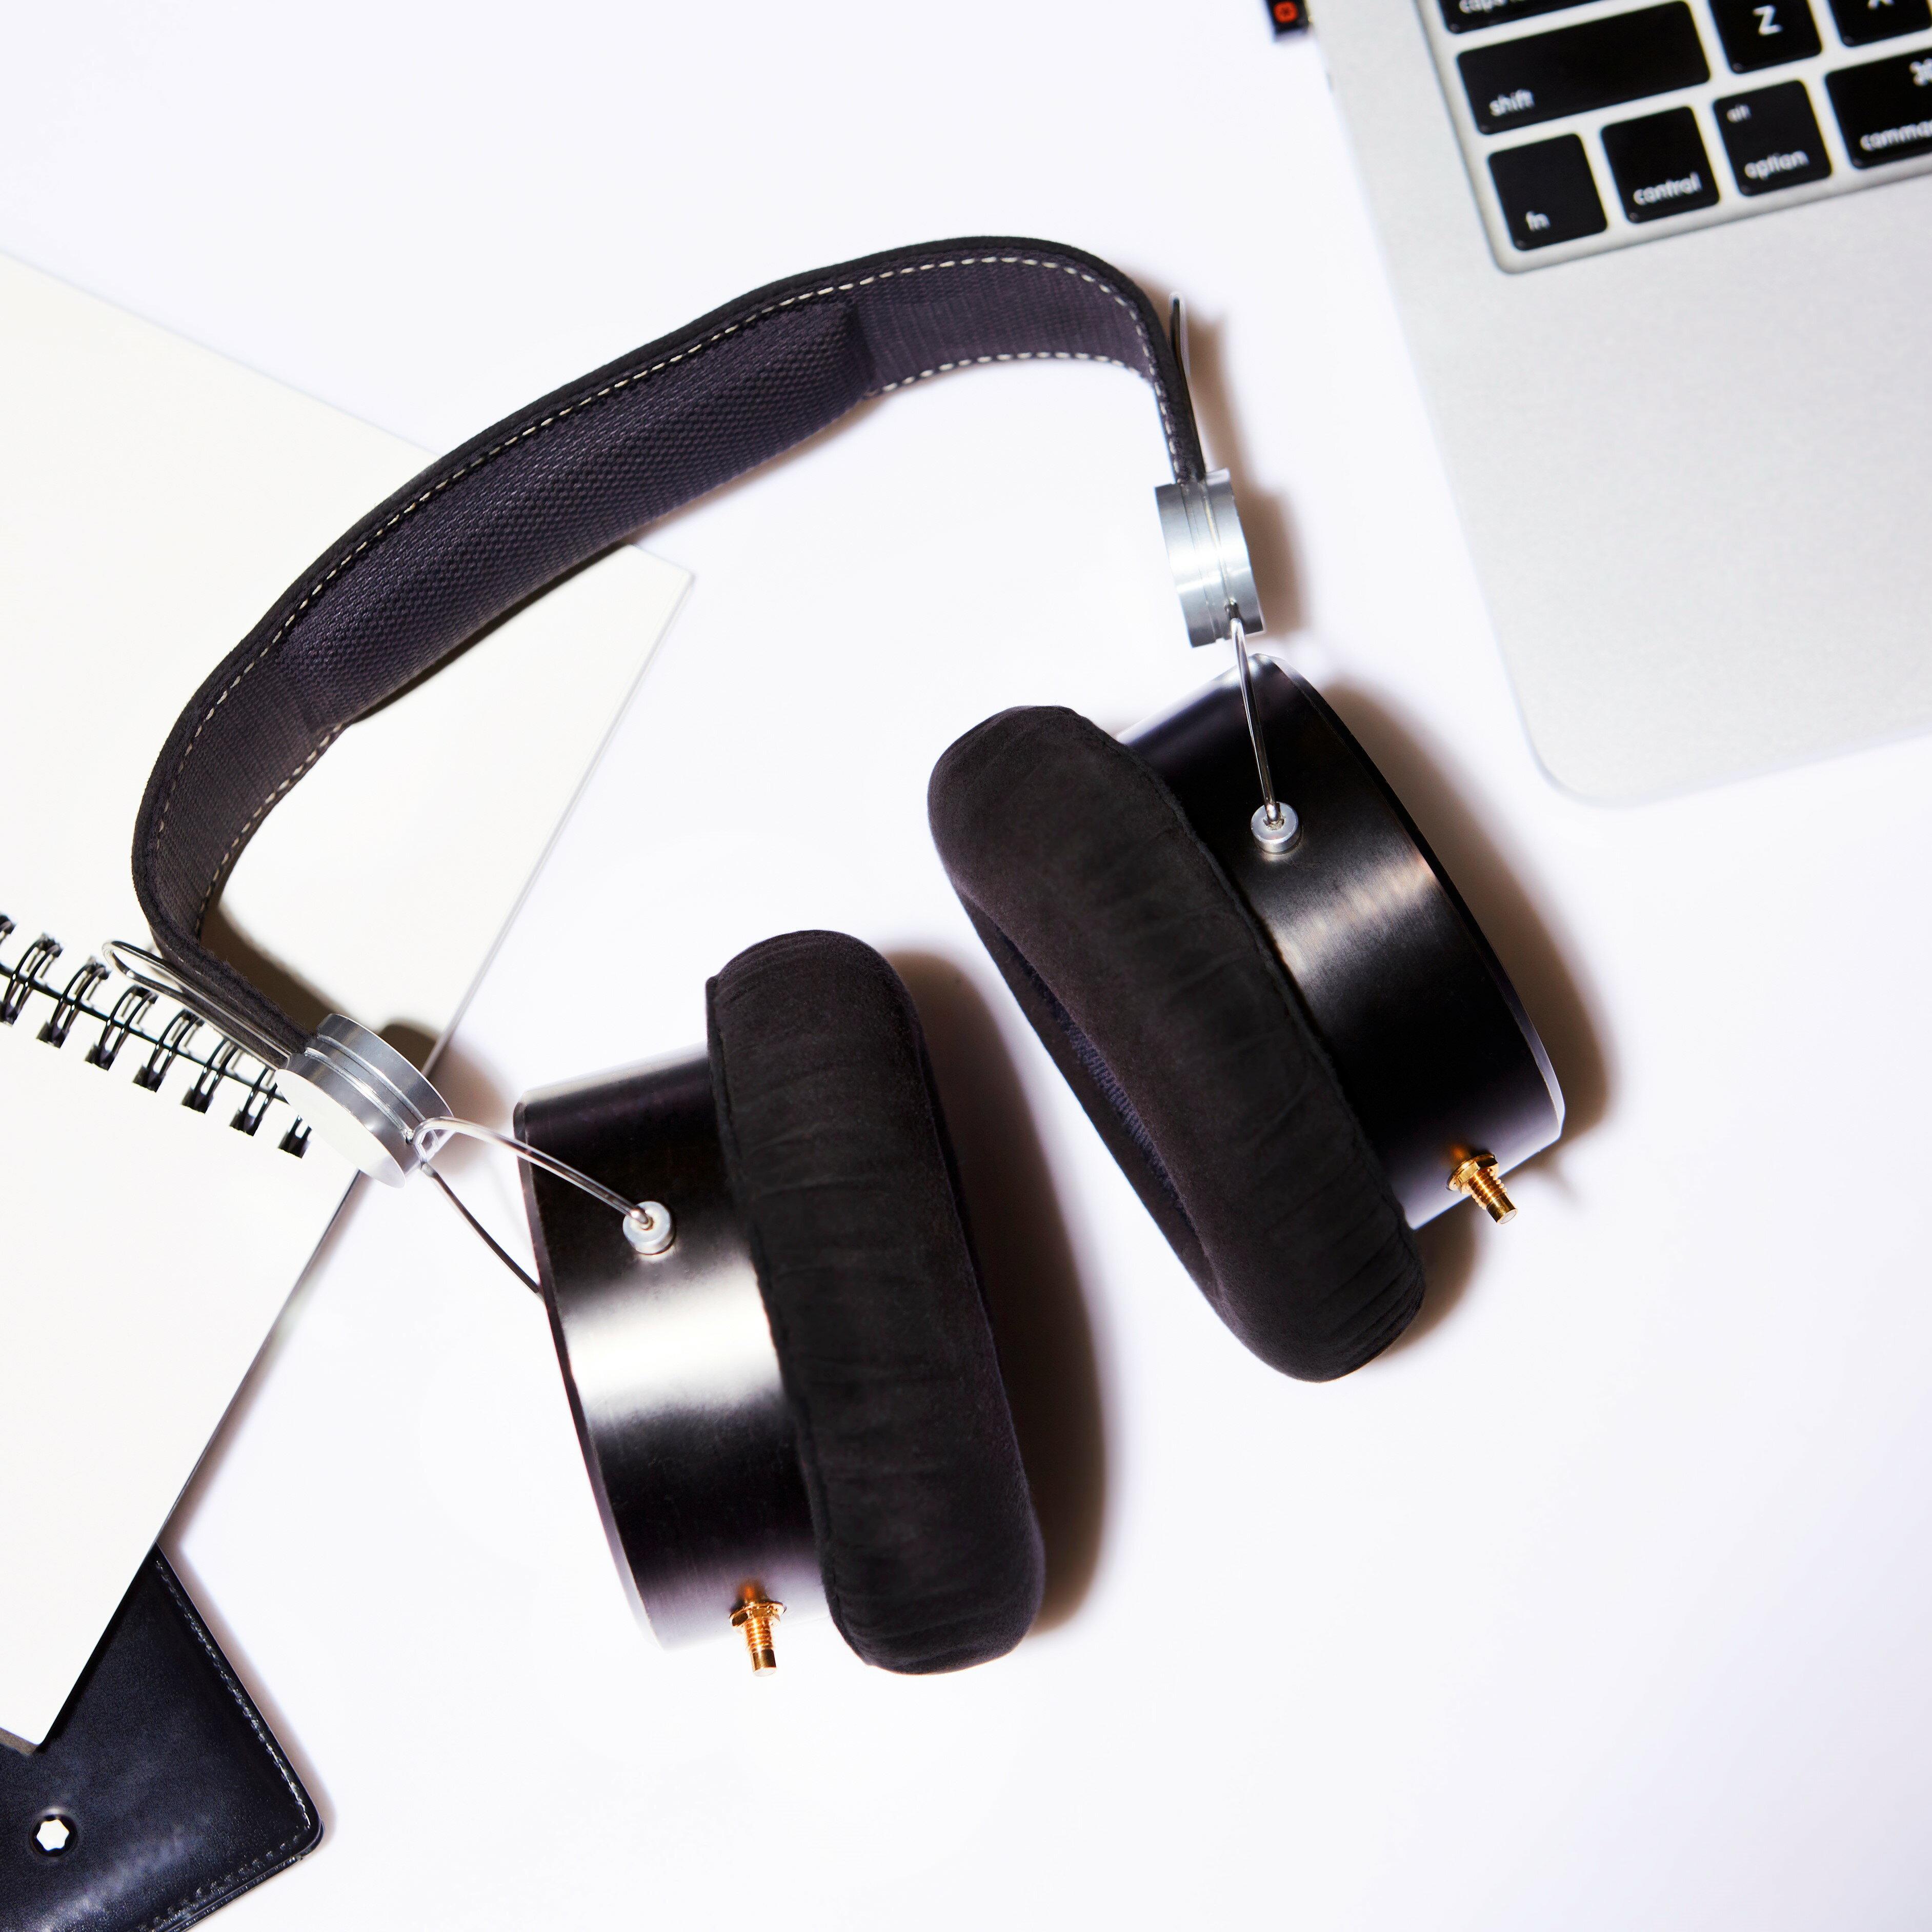 oBravo HAMT-3 MKII High-End 耳罩式耳機 氣動式高音 動圈 自主調音